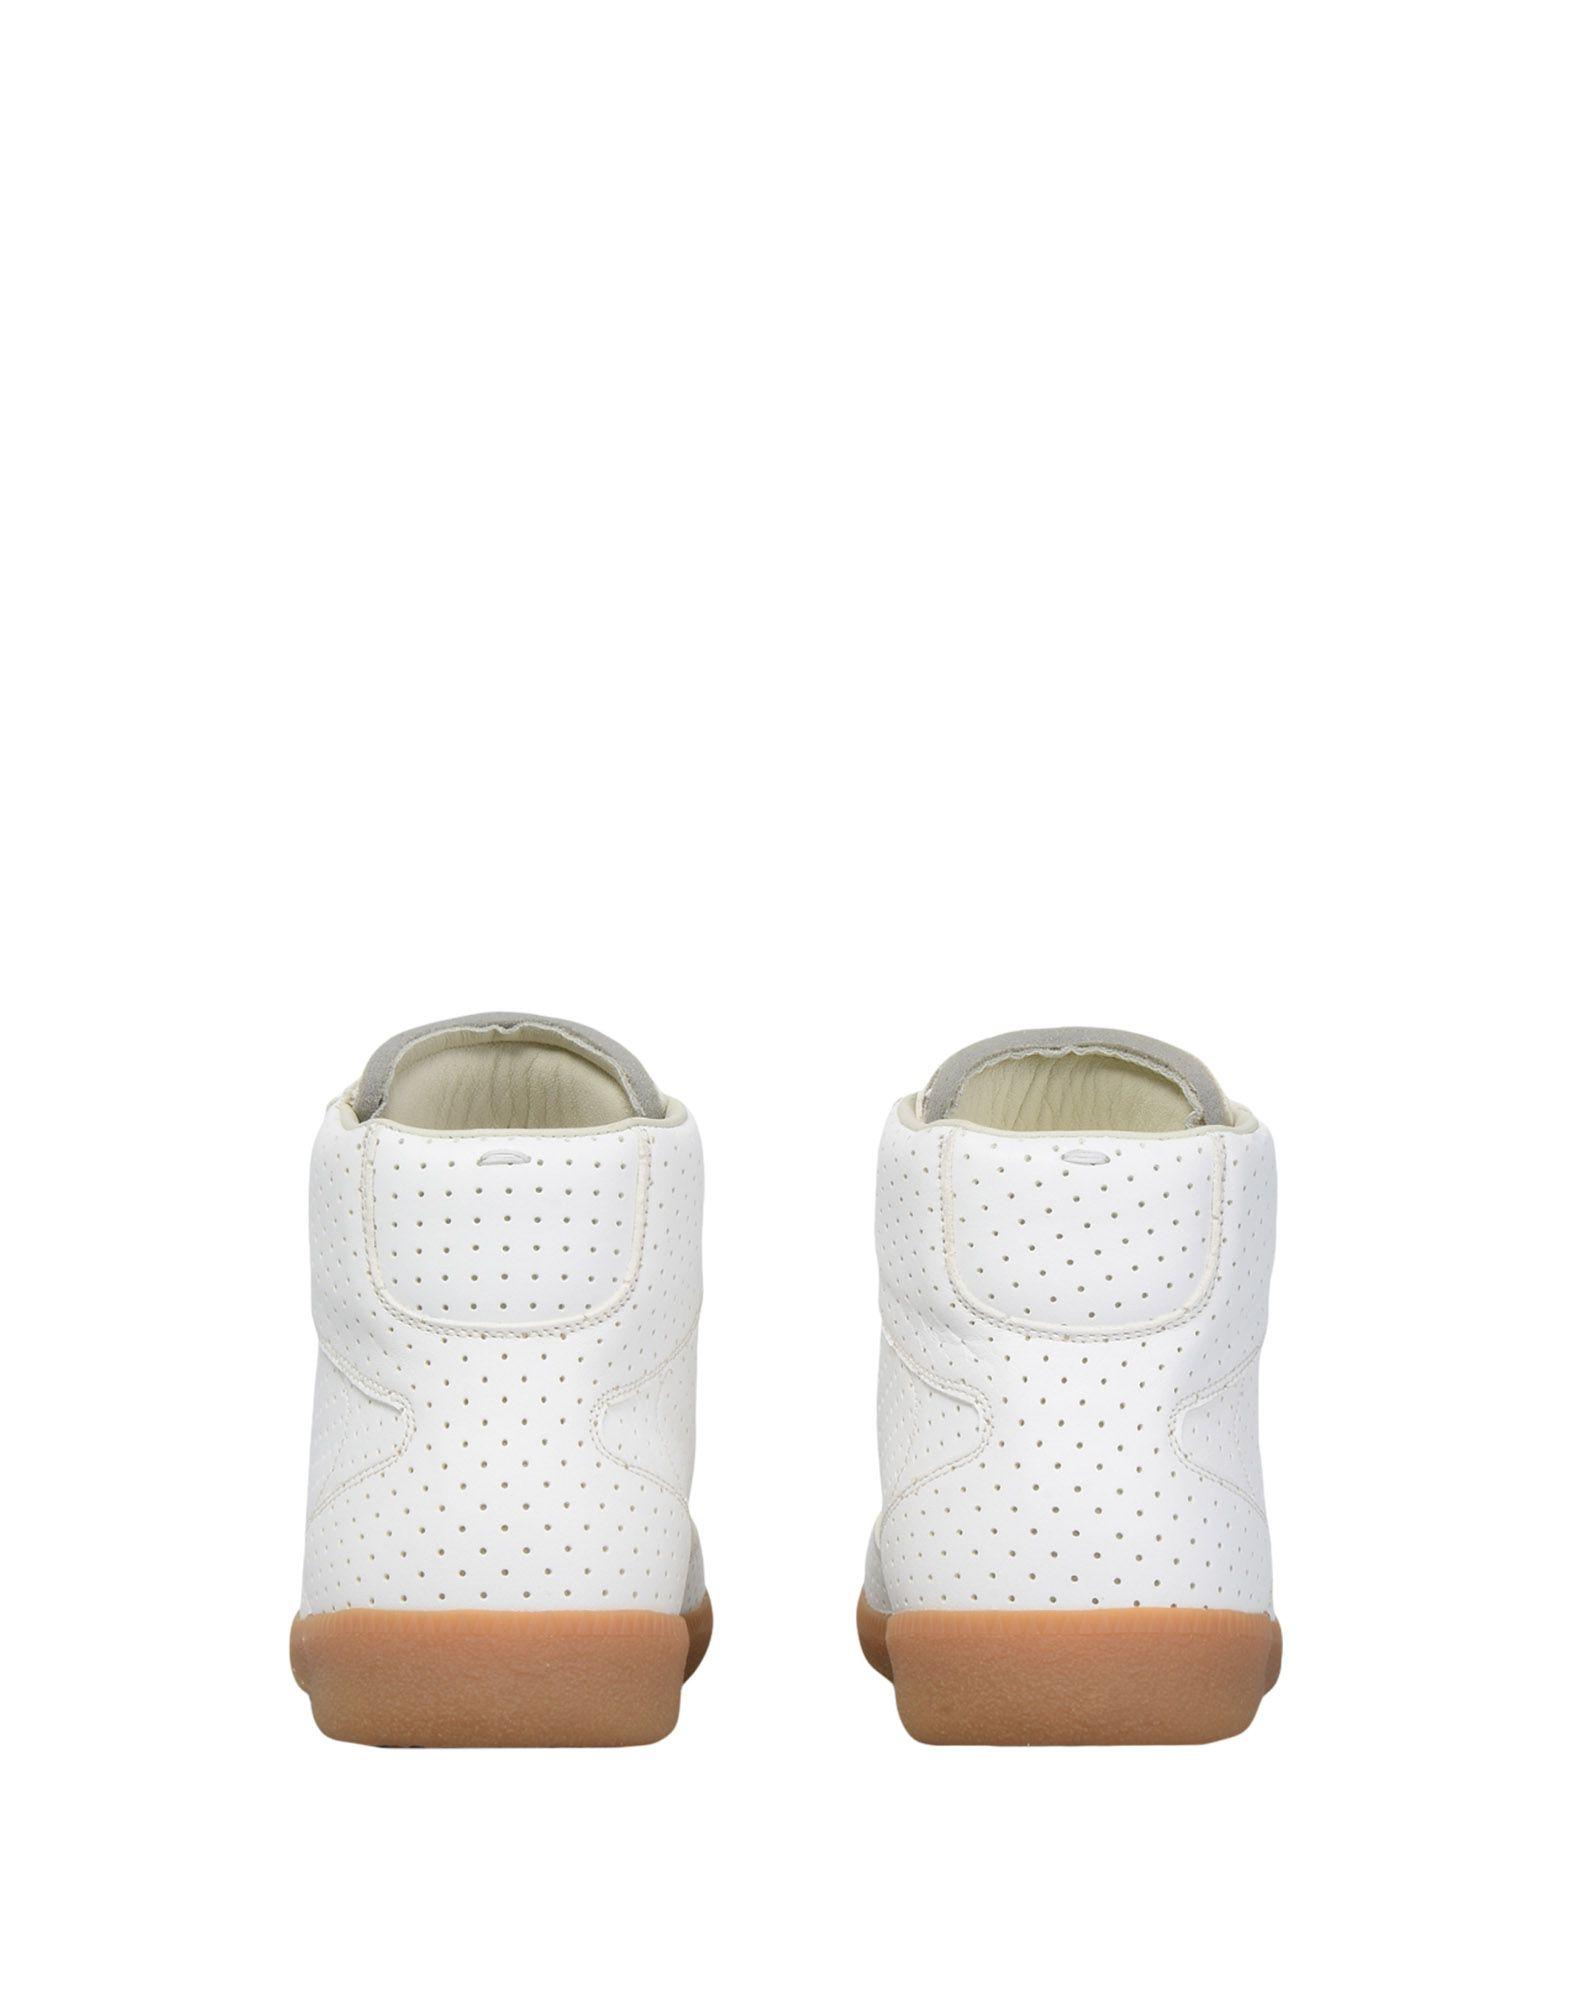 Maison Margiela Sneakers Sneakers Margiela Herren  11424913BJ 6cd699